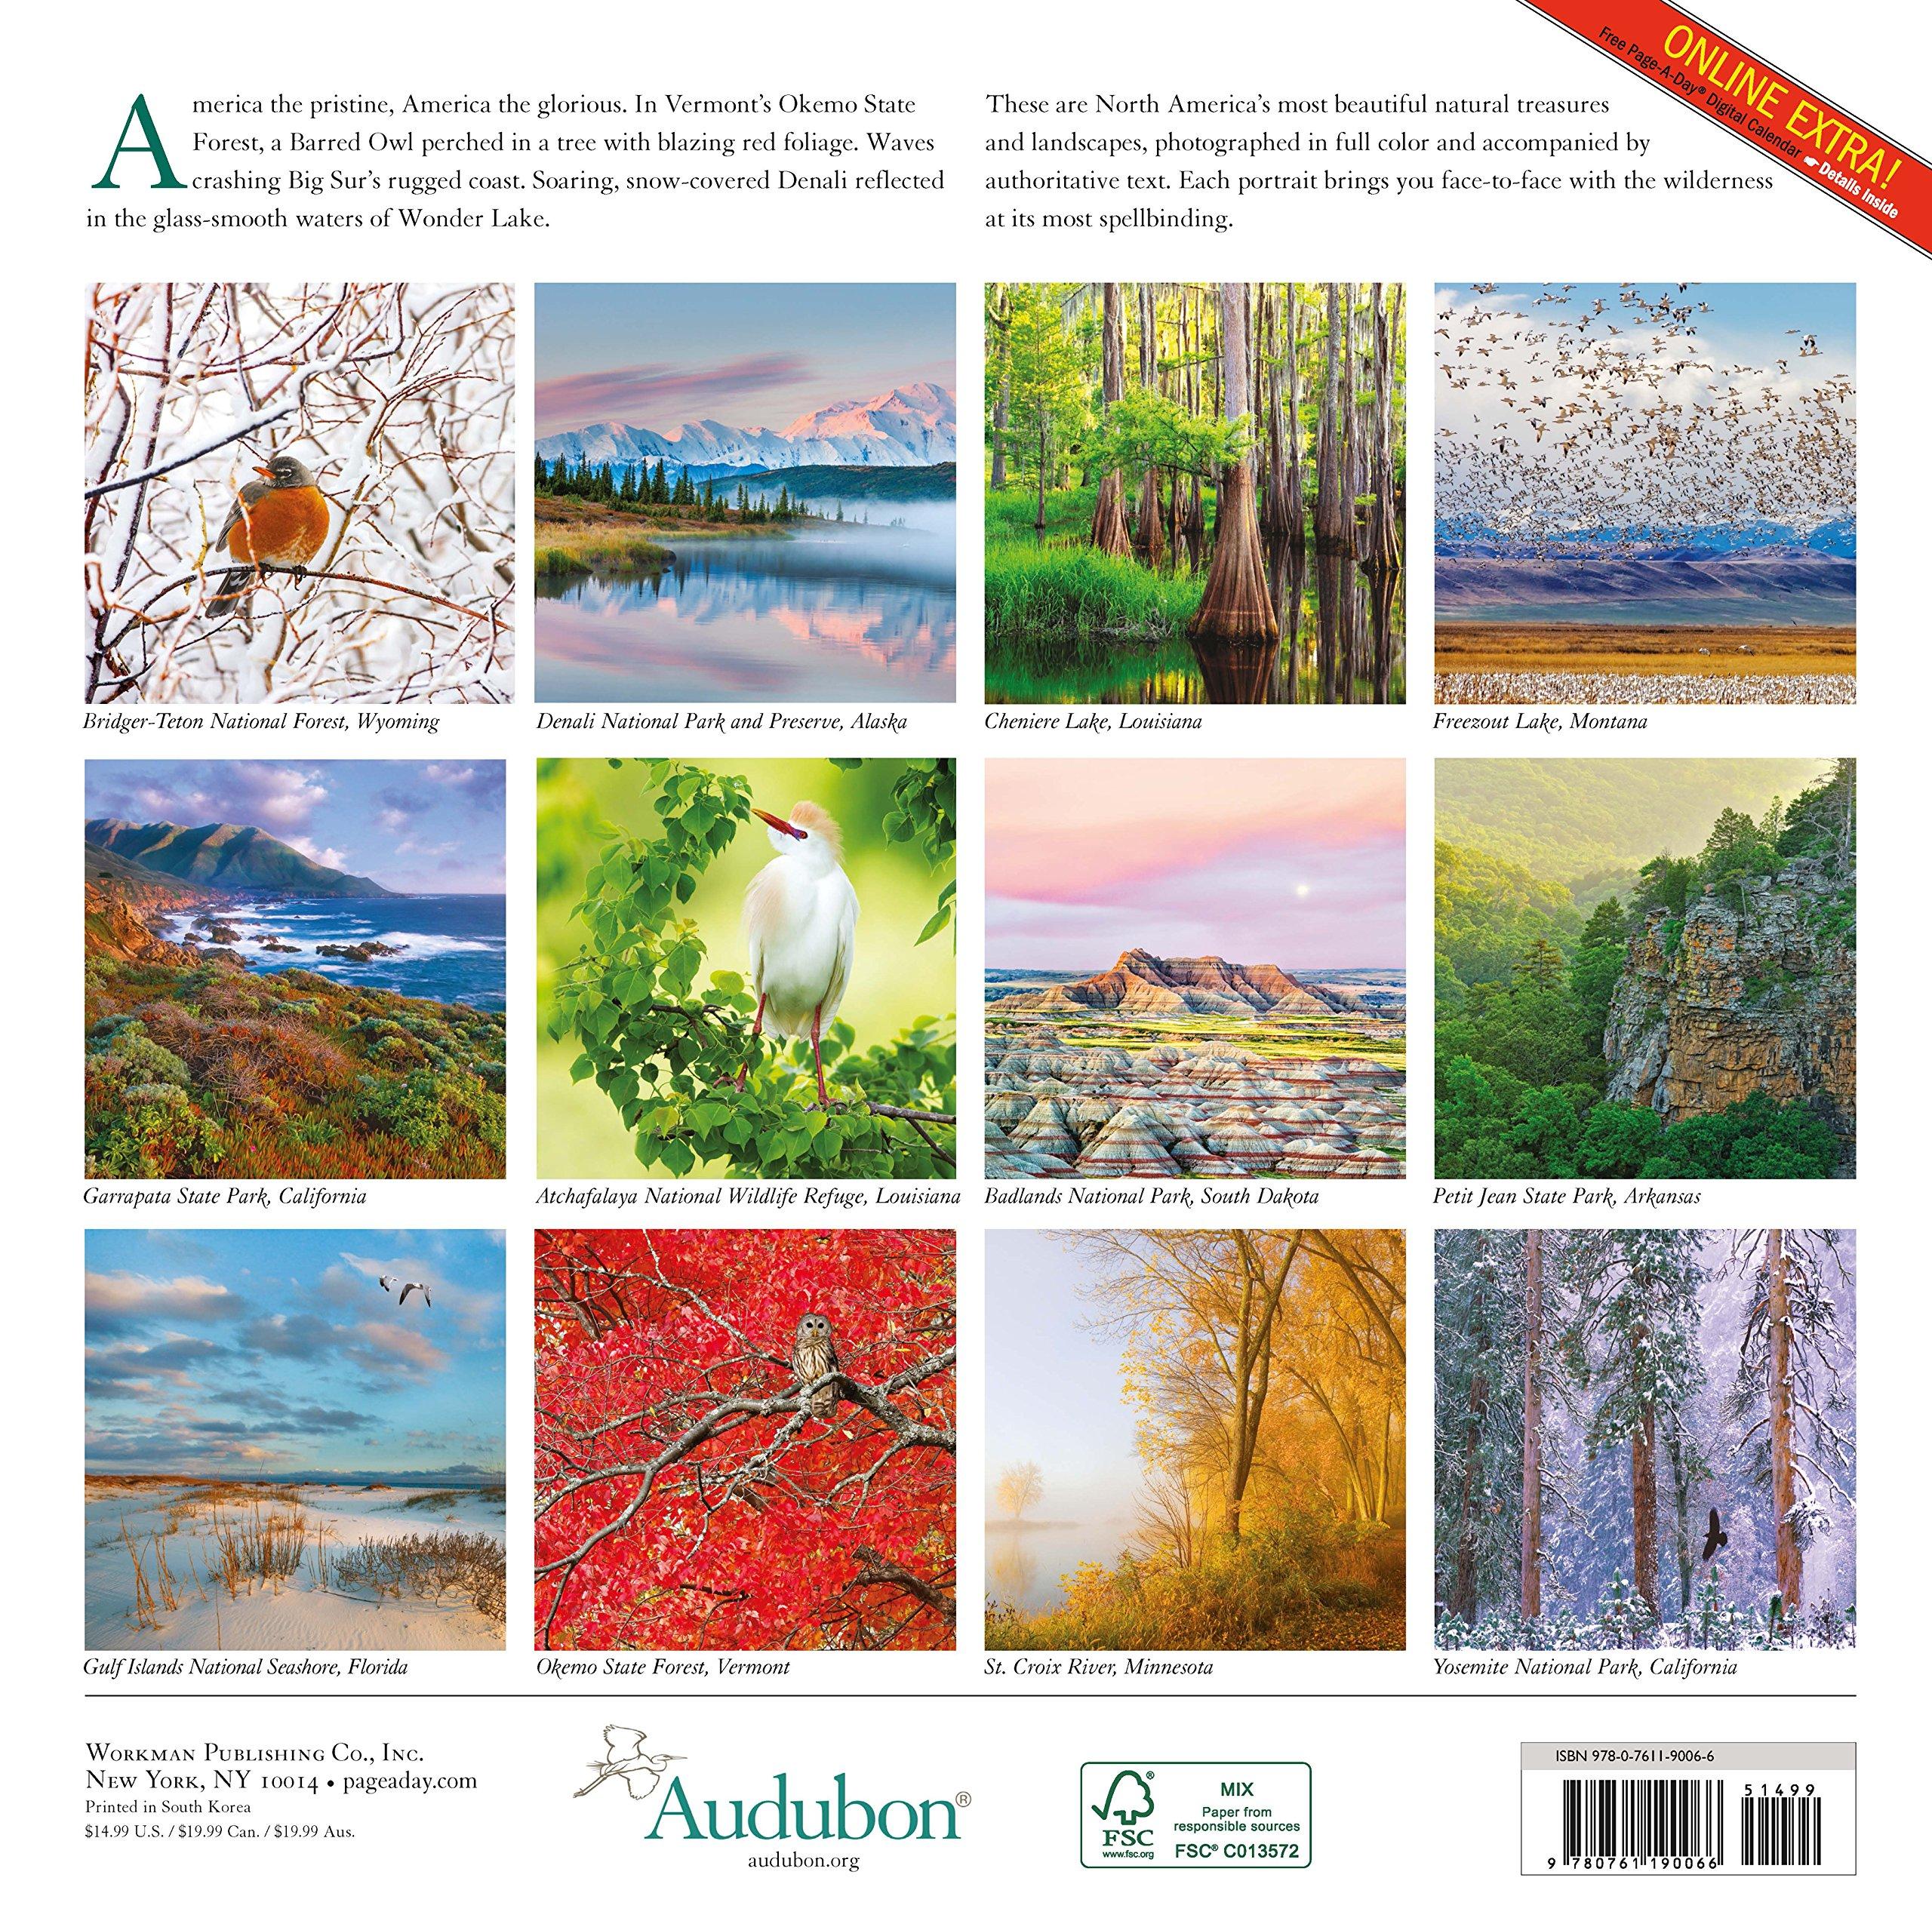 audubon nature wall calendar 2017 calendar amazon. Black Bedroom Furniture Sets. Home Design Ideas